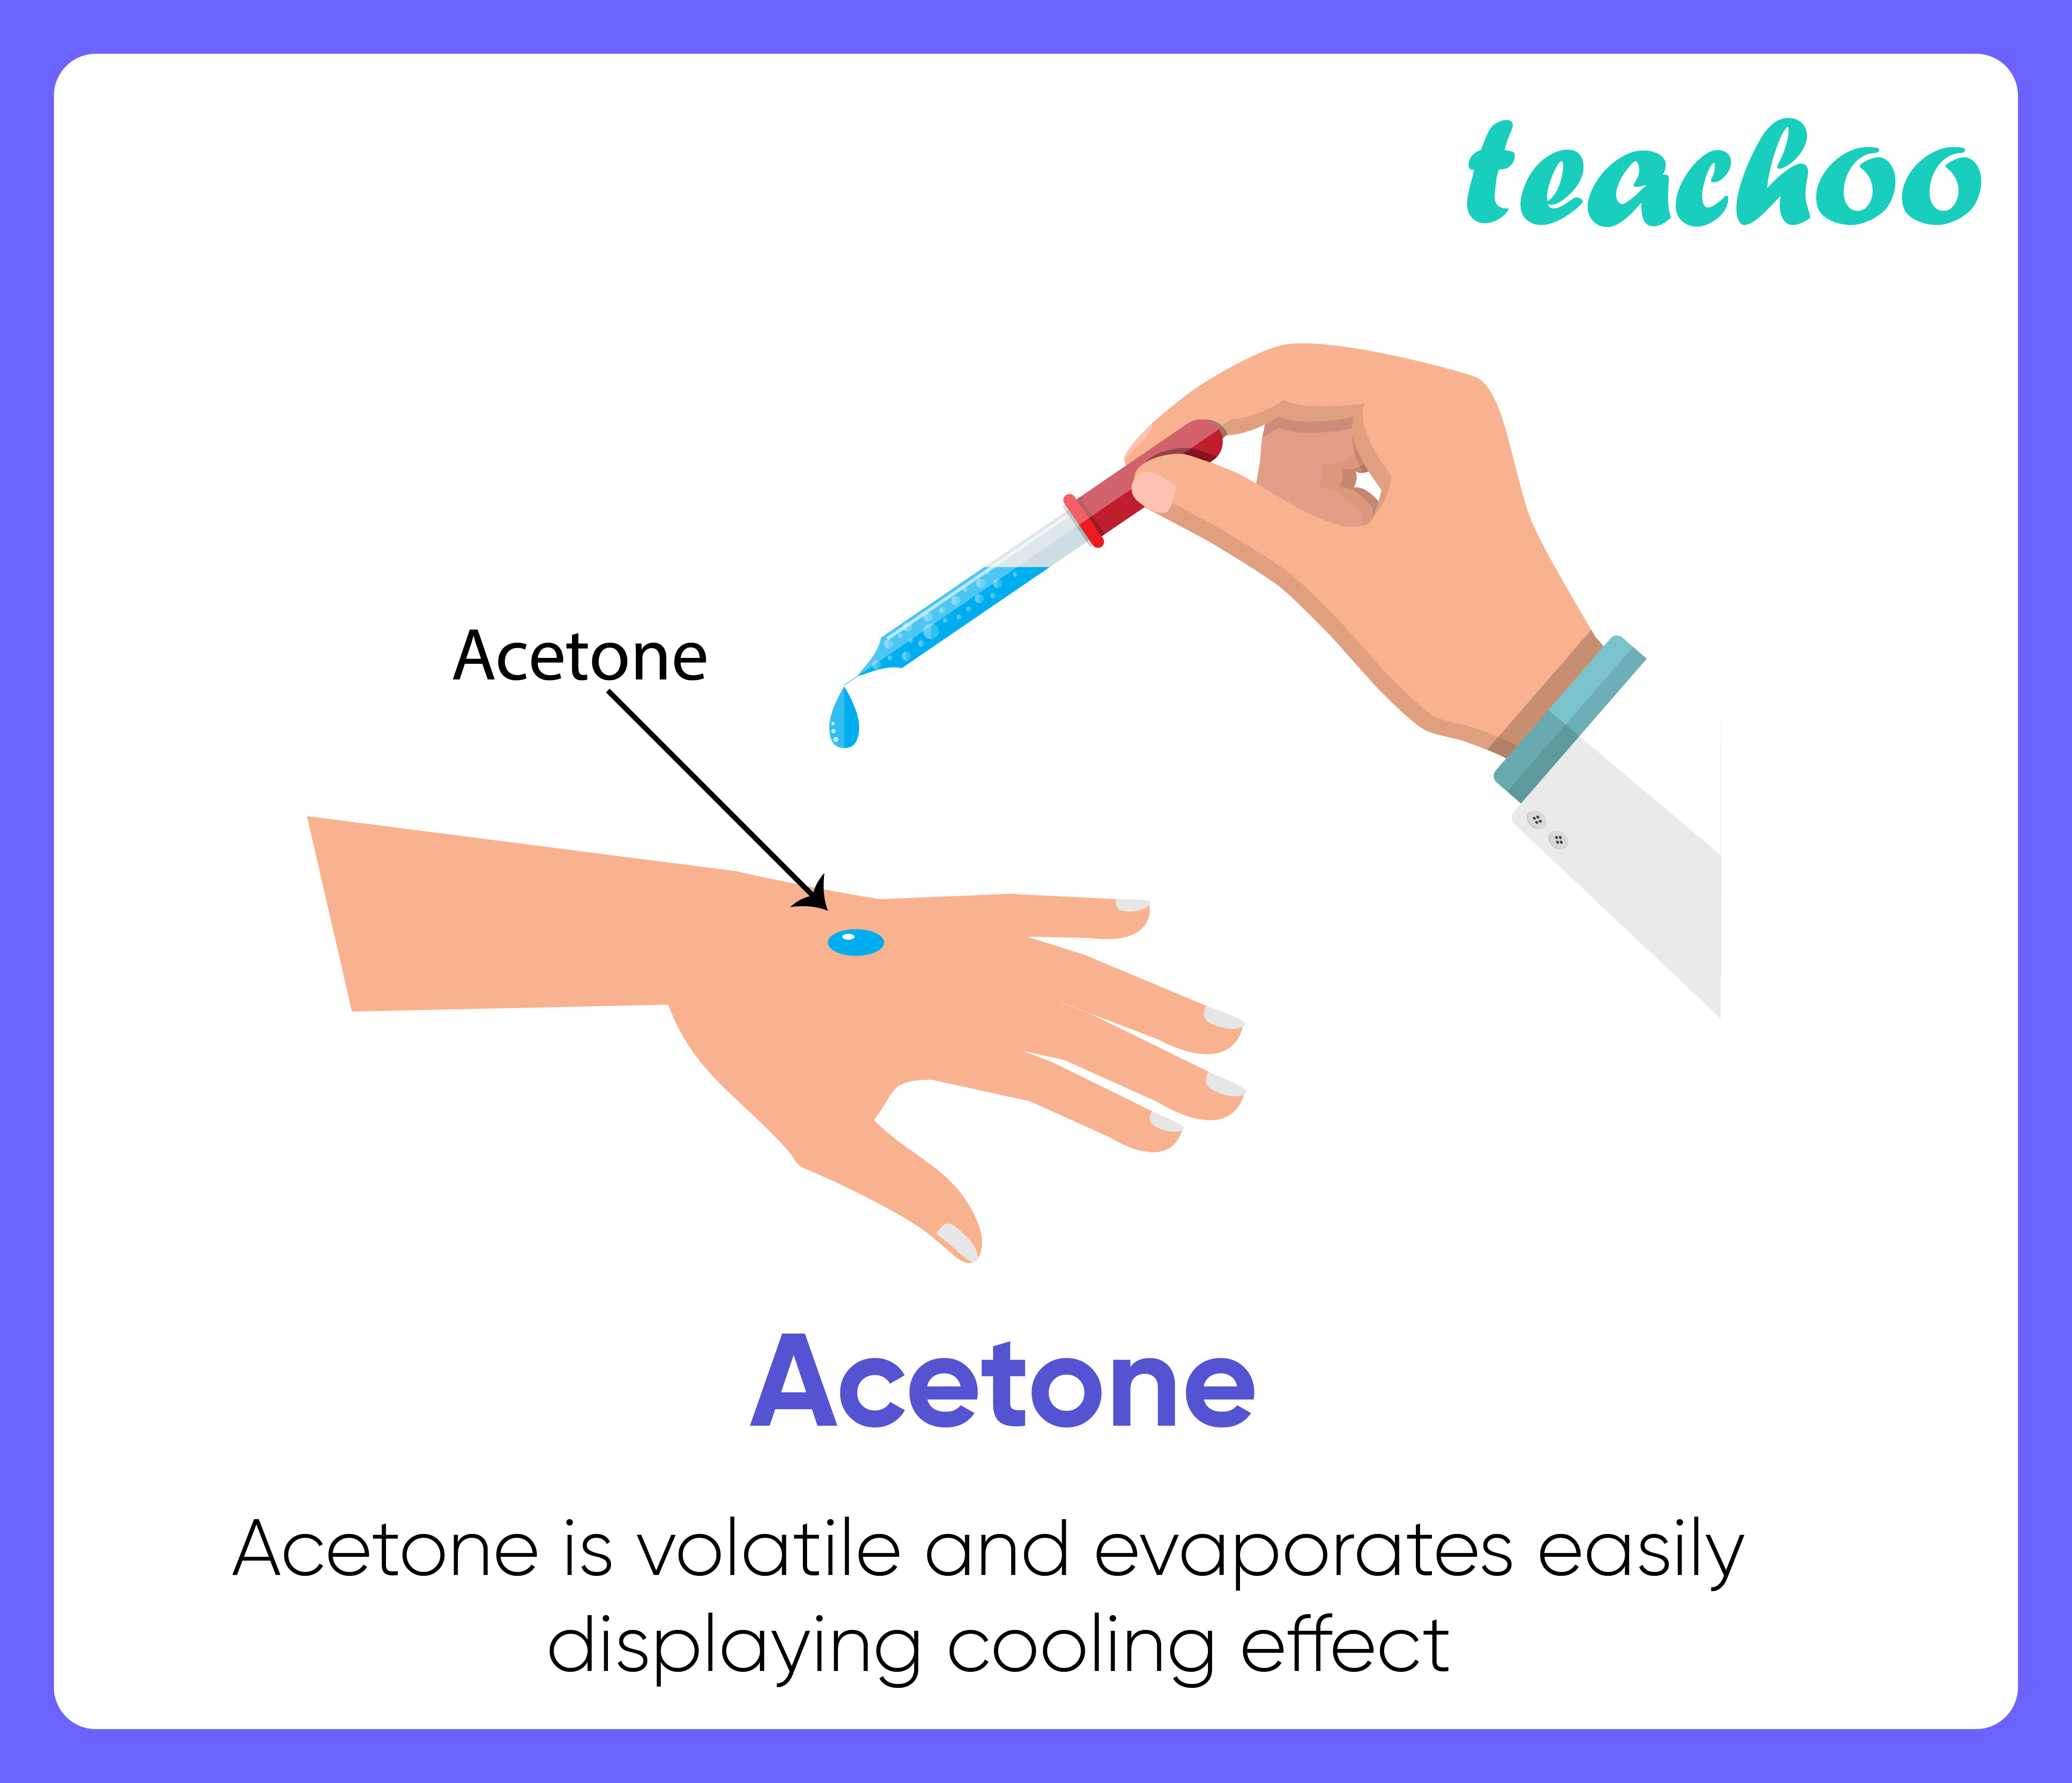 Acetone-Teachoo-01.png